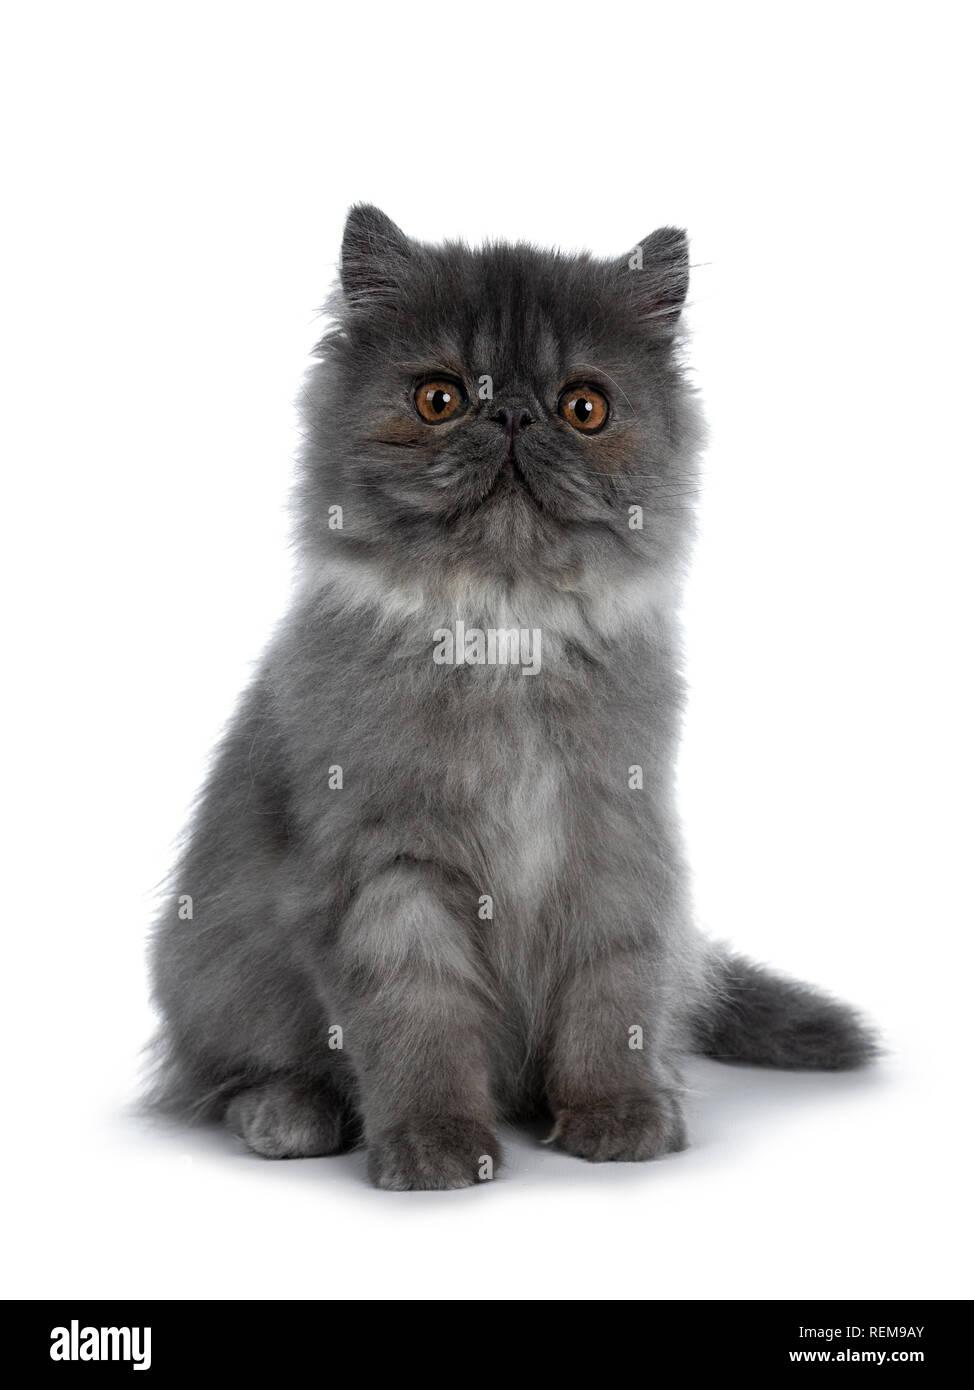 Cute black smoke Persian cat kitten, sitting up facing front